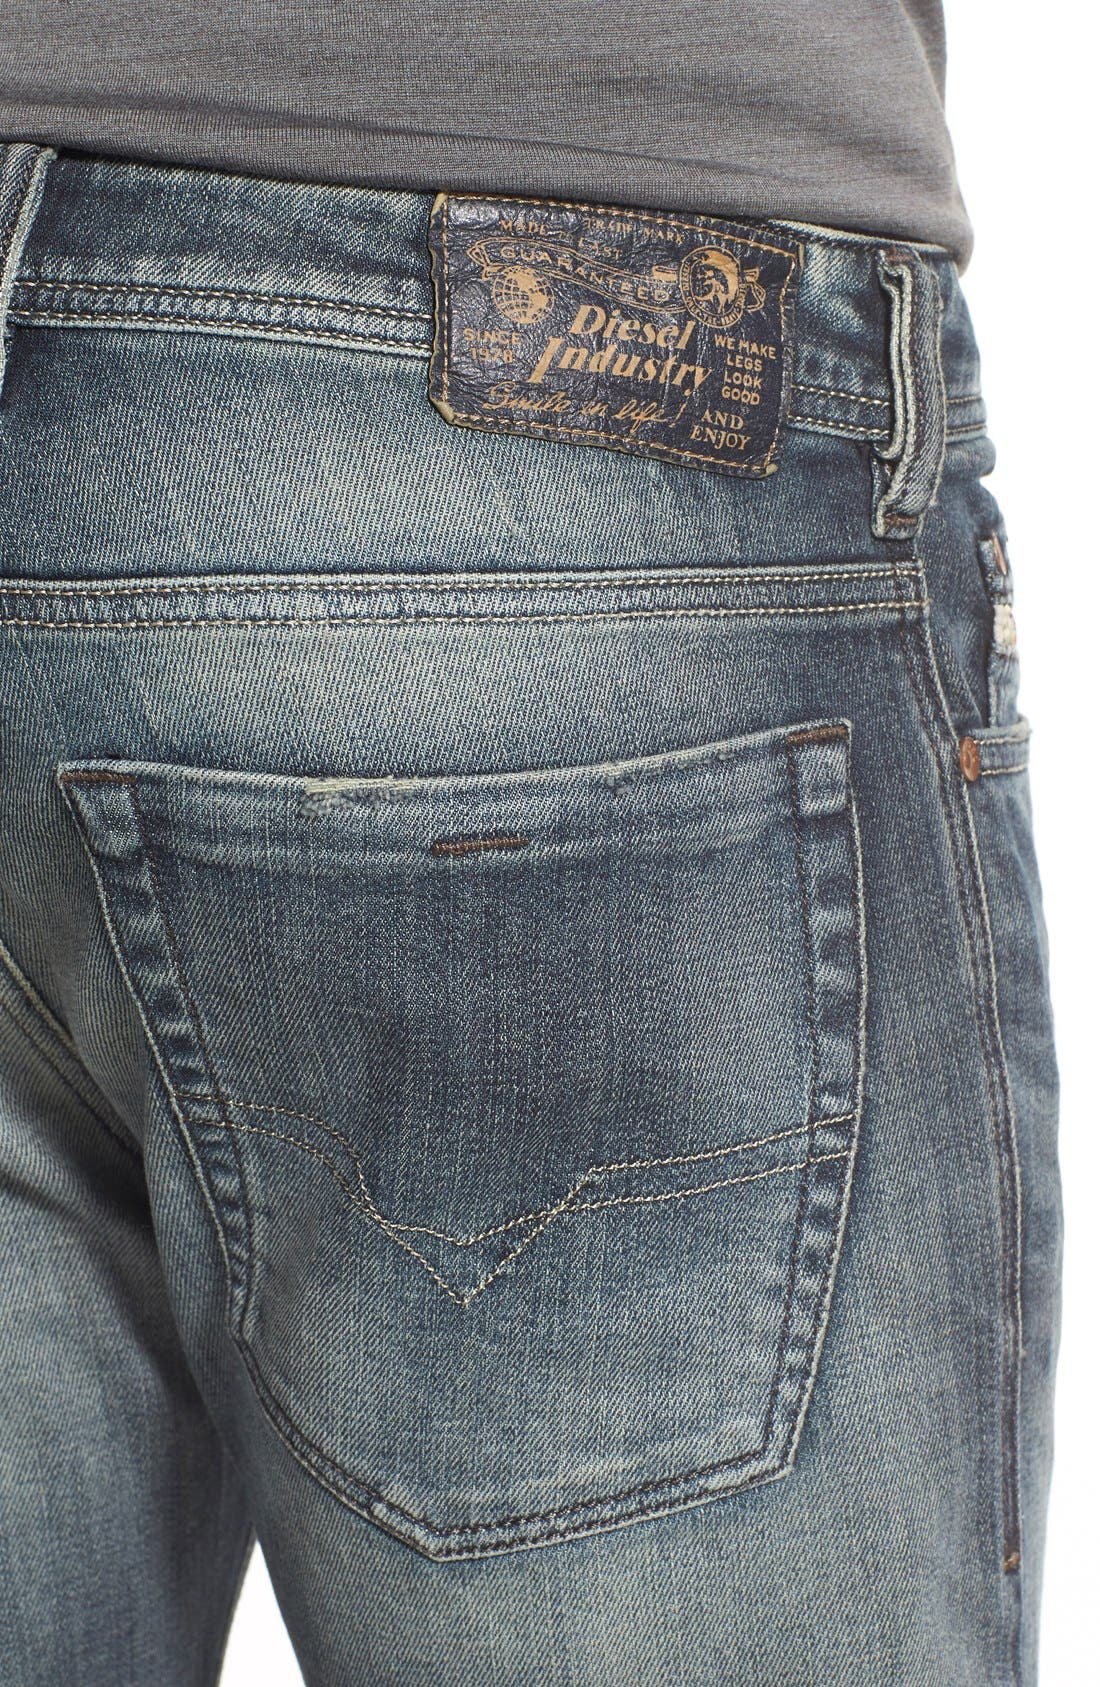 'Zathan' Bootcut Jeans,                             Alternate thumbnail 2, color,                             400